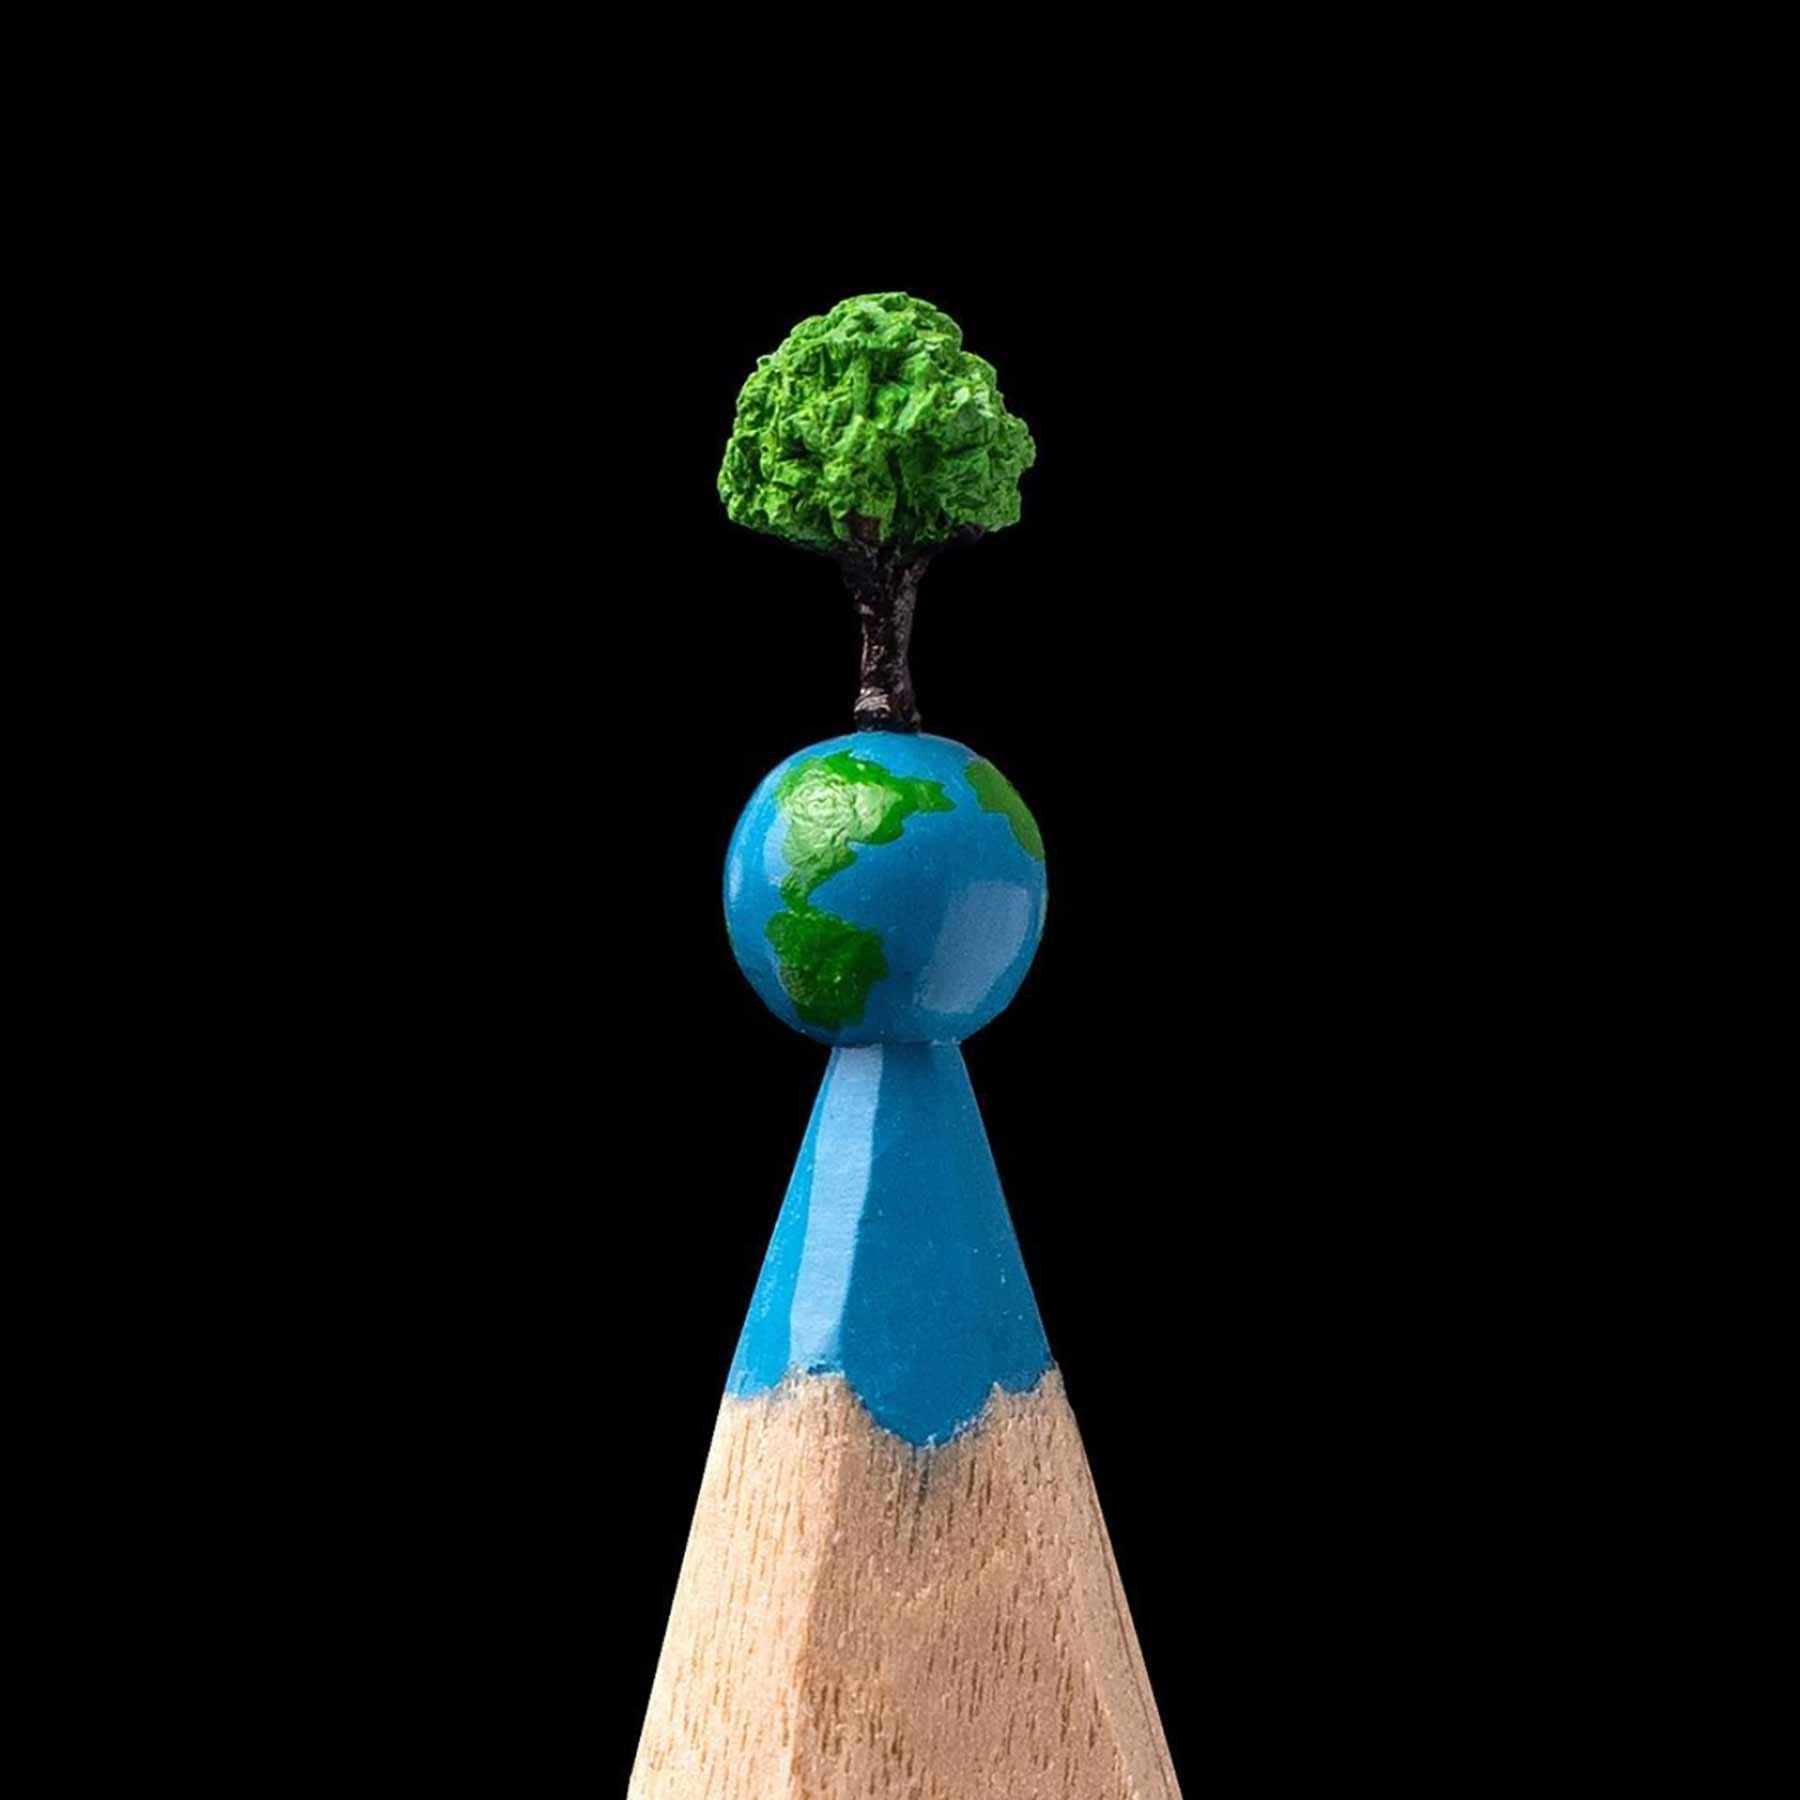 Miniatur-Skultpuren aus Stiftminen von Salavat Fidai minen-miniatur-skulpturen-Salavat-Fidai_08